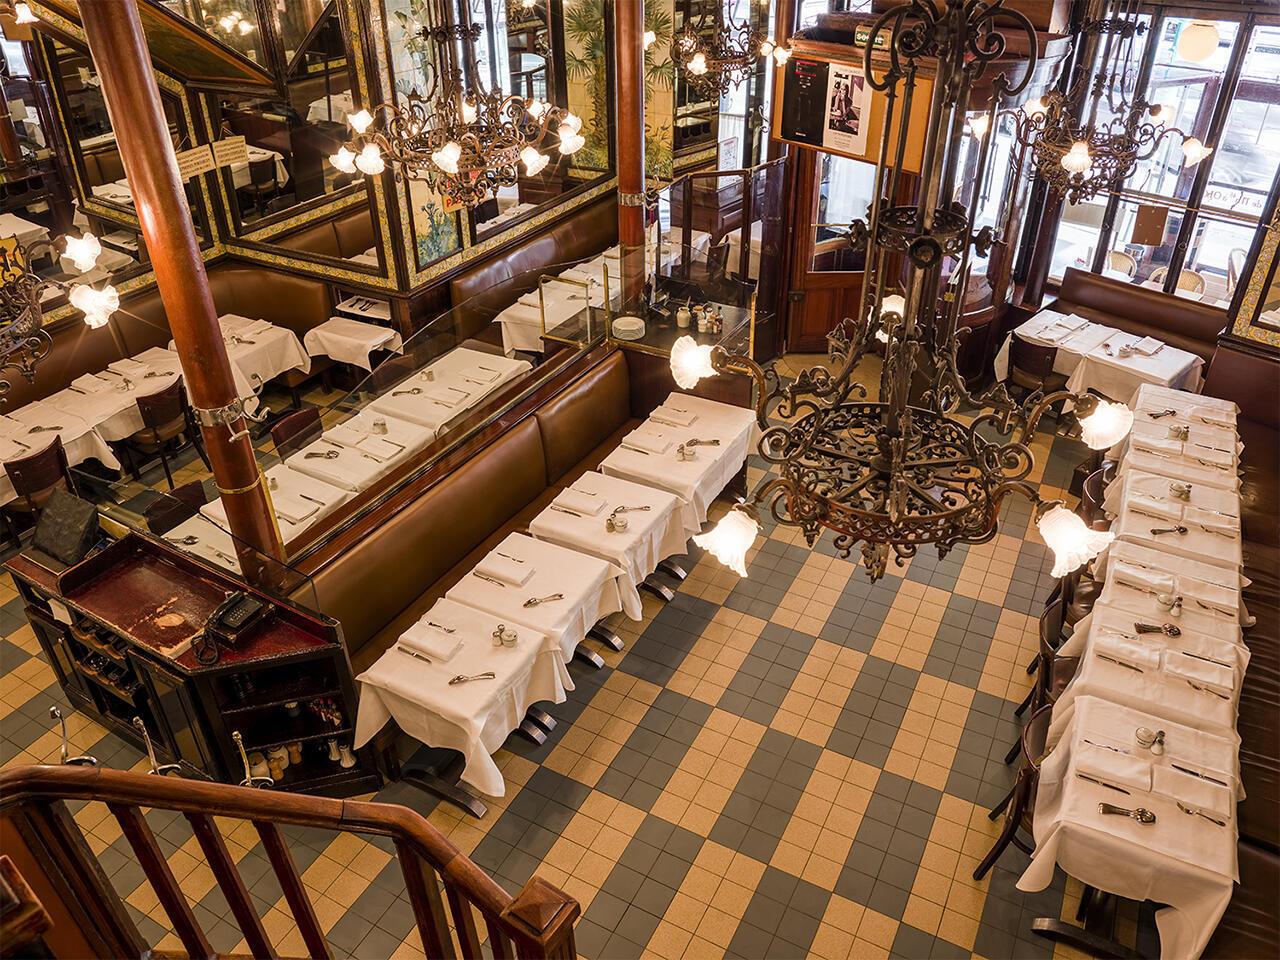 Исторические рестораны Парижа. Ресторан Lipp, бульвар Сен-Жермен.